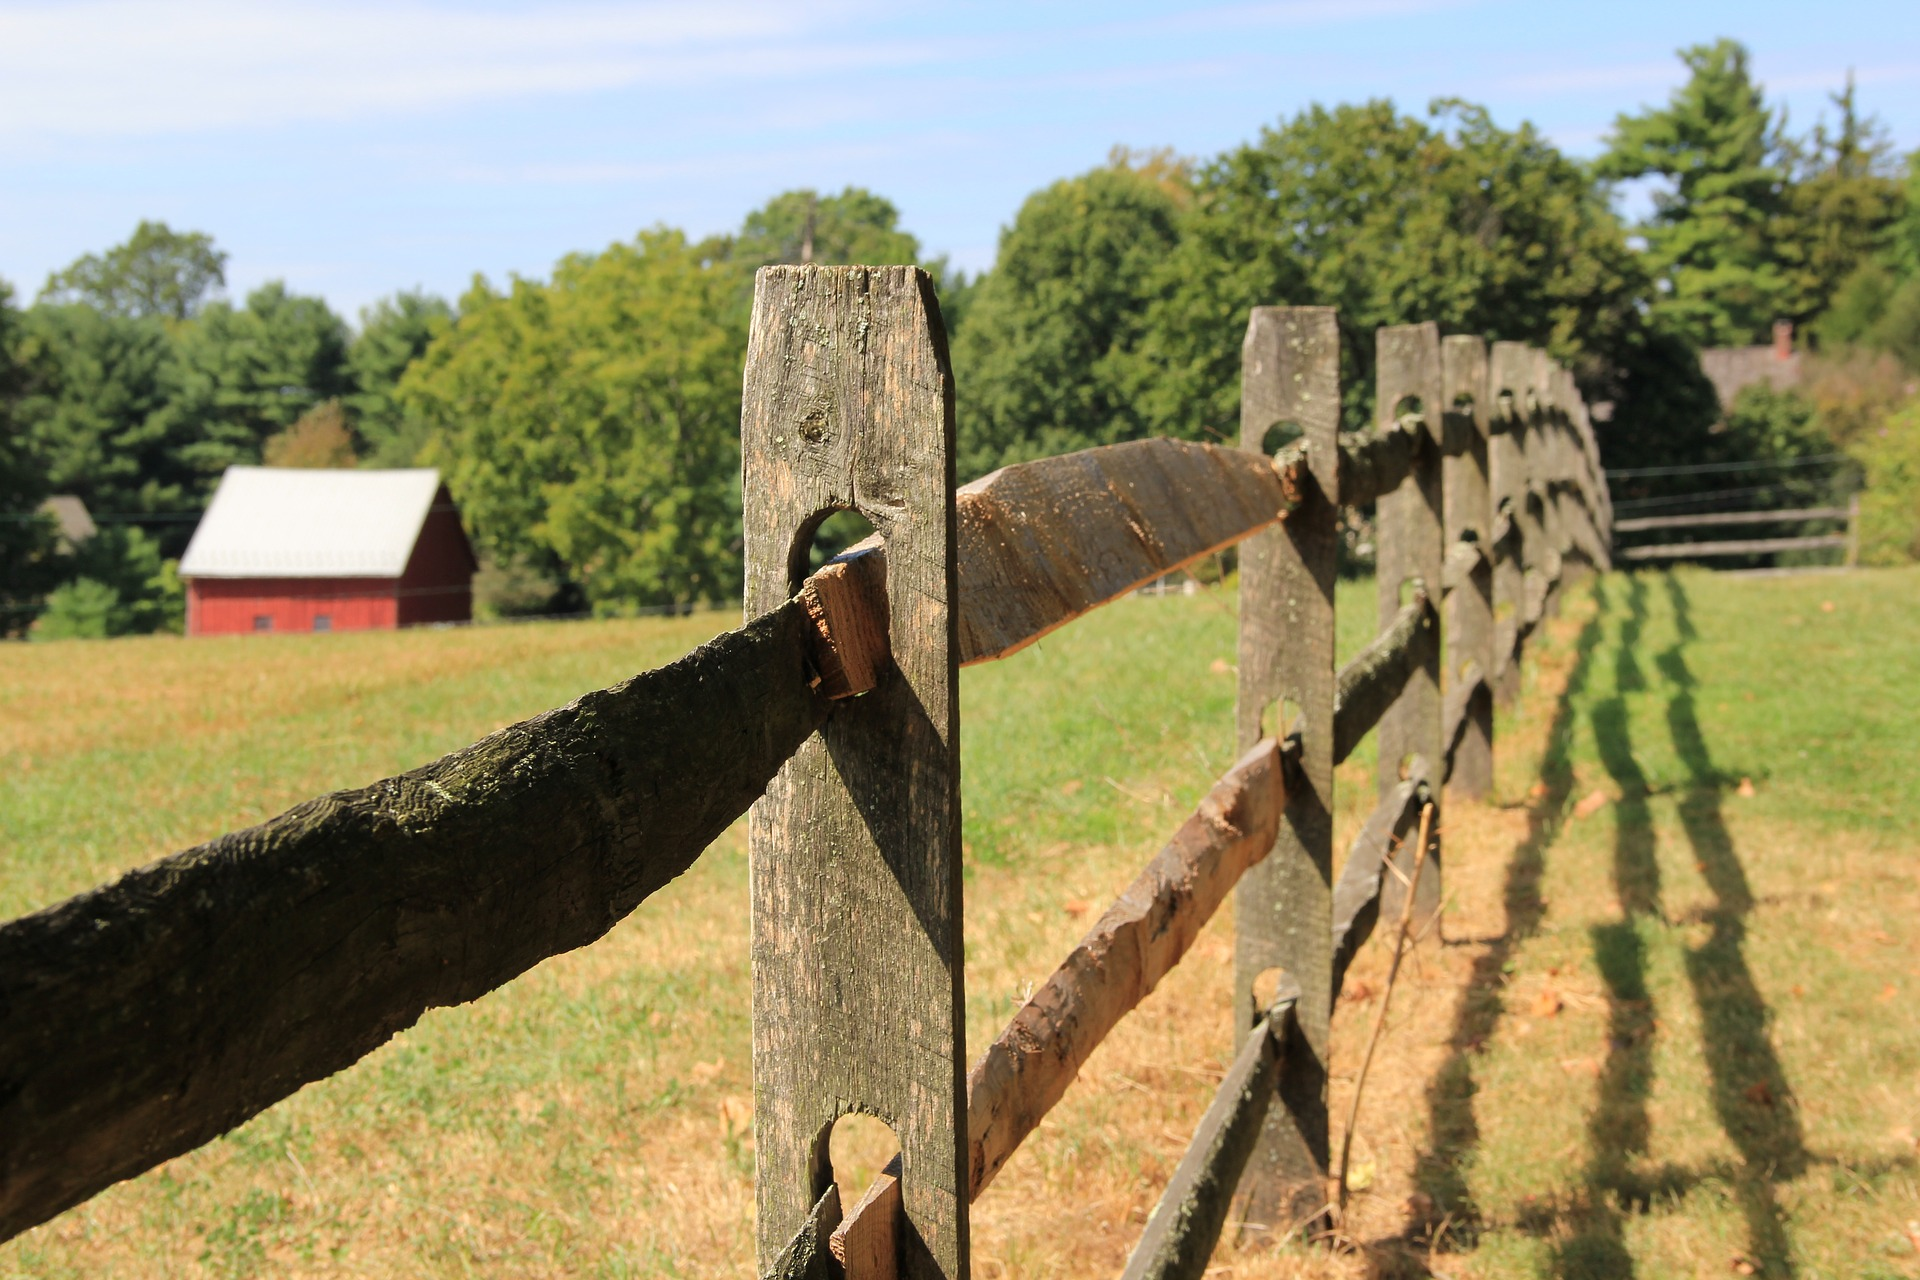 fence-2199026_1920.jpg